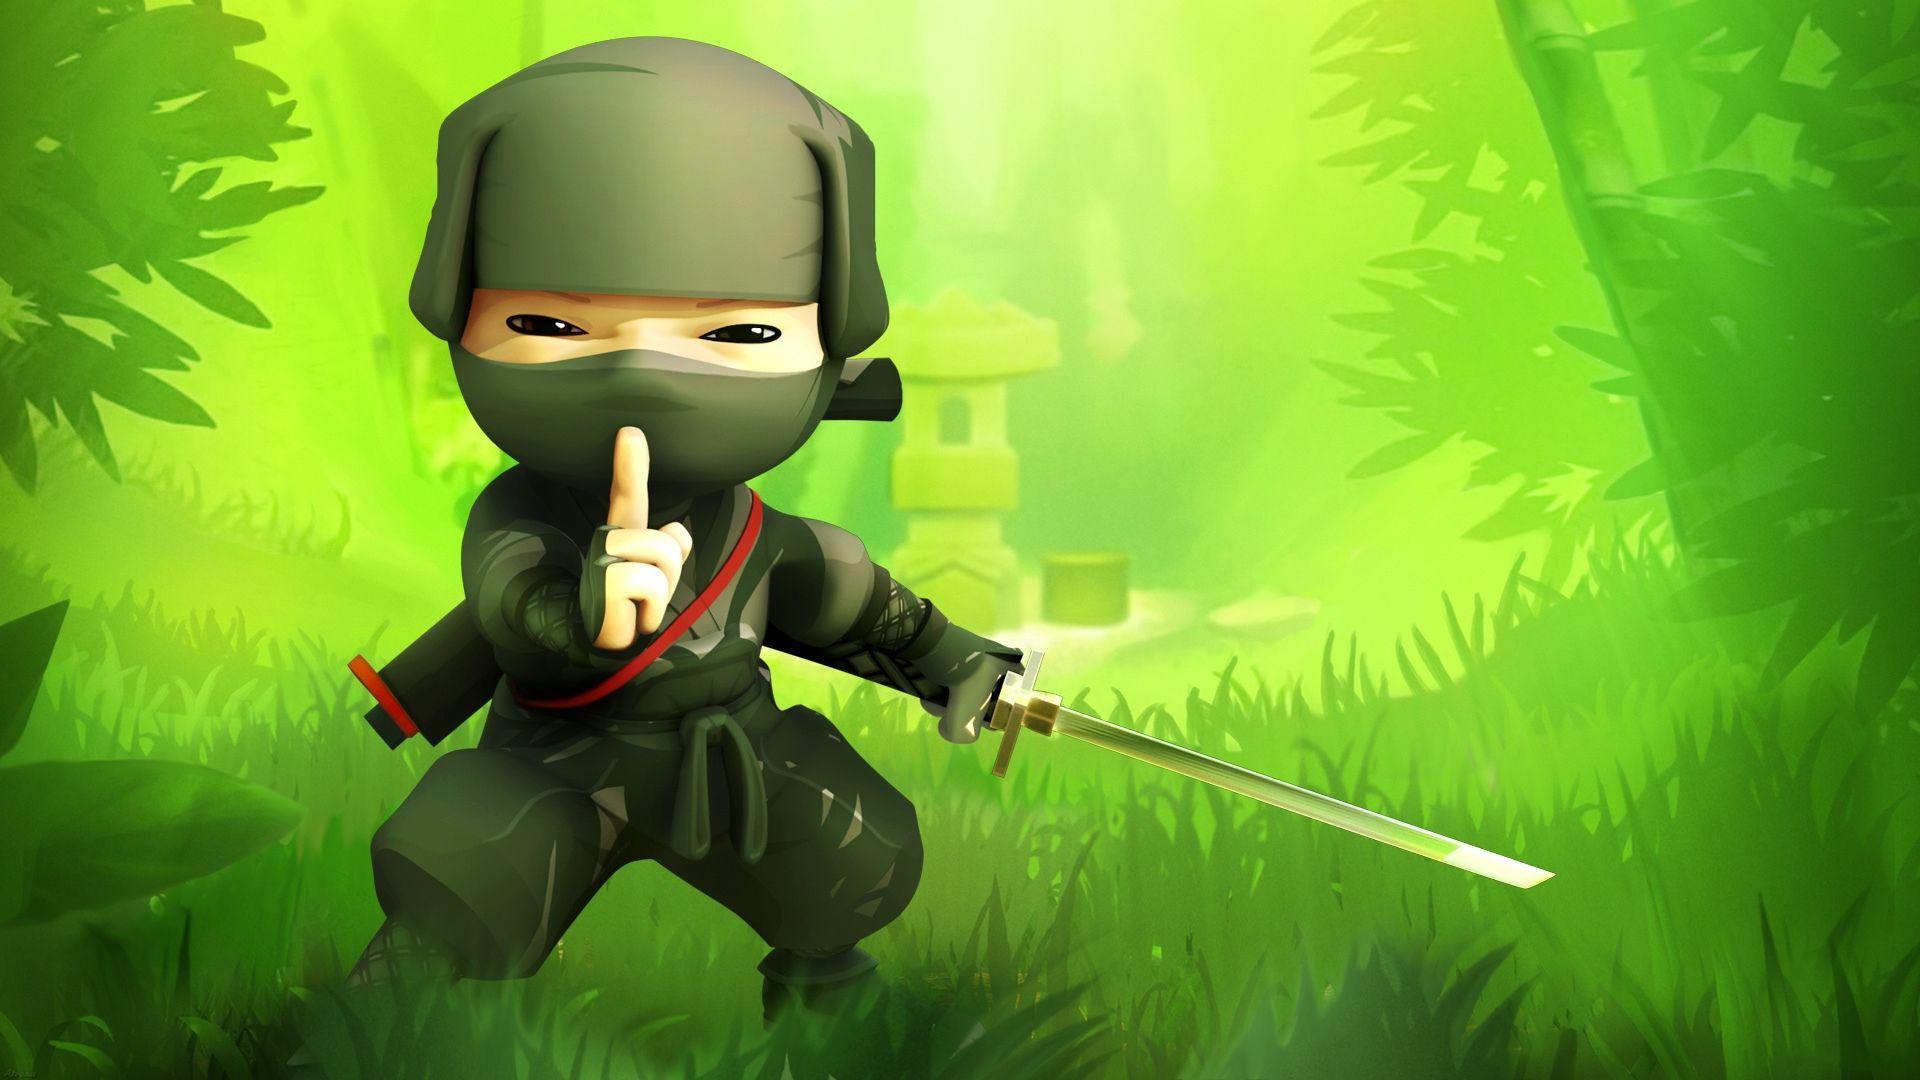 cartoon ninja wallpapers top free cartoon ninja backgrounds wallpaperaccess cartoon ninja wallpapers top free